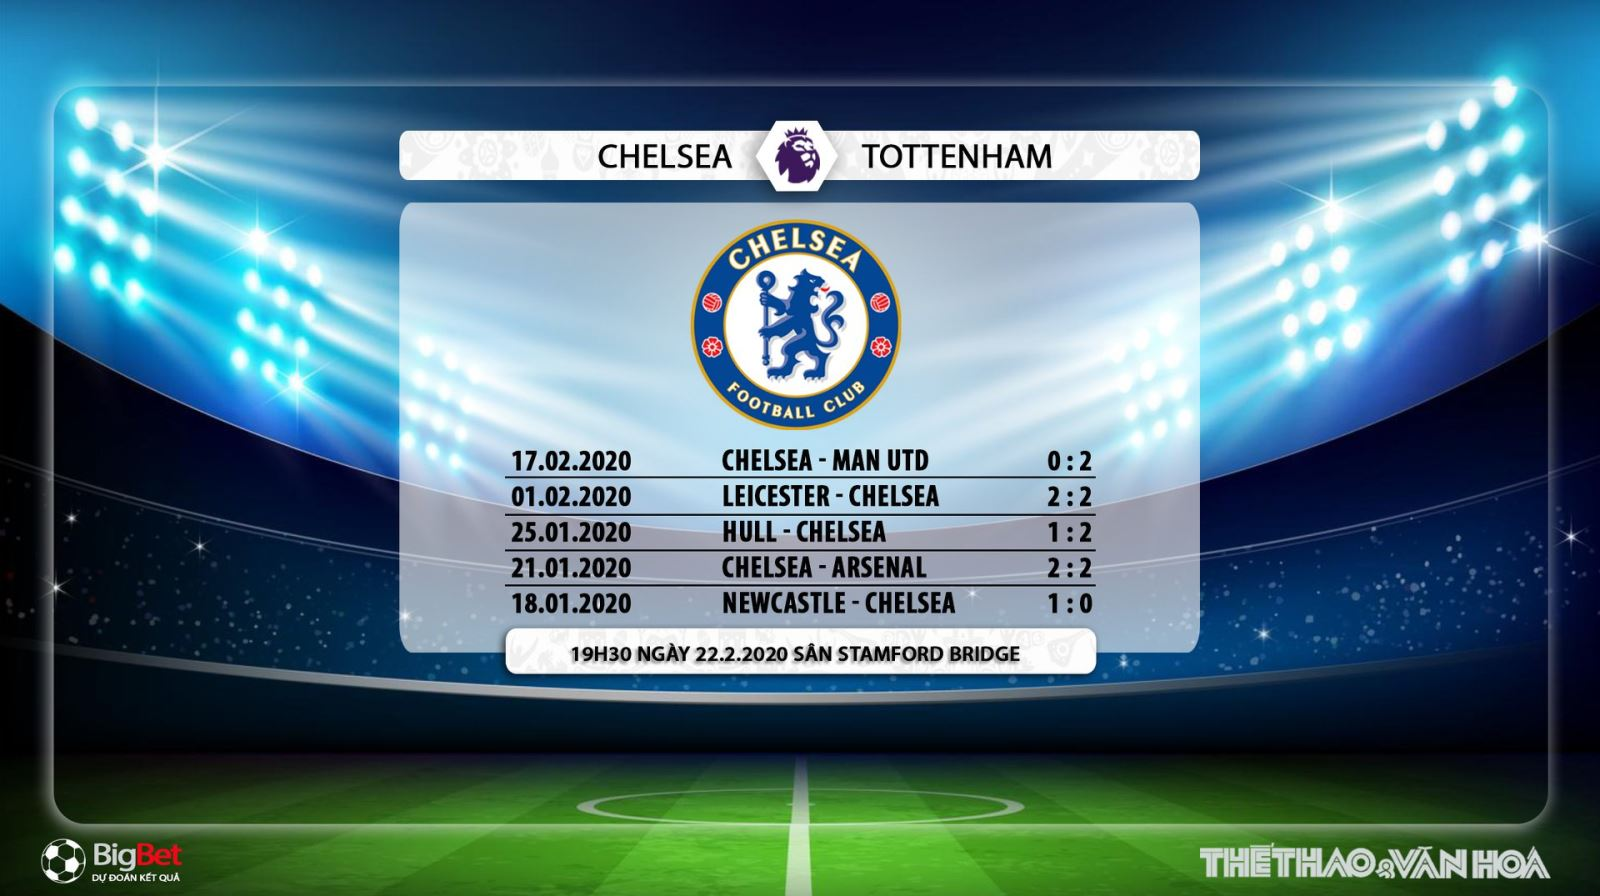 Chelsea vs Tottenham, chelsea, tottenham, trực tiếp Chelsea vs Tottenham, chelsea đấu với tottenham, soi kèo Chelsea vs Tottenham, K+PC, K+PM, bóng đá